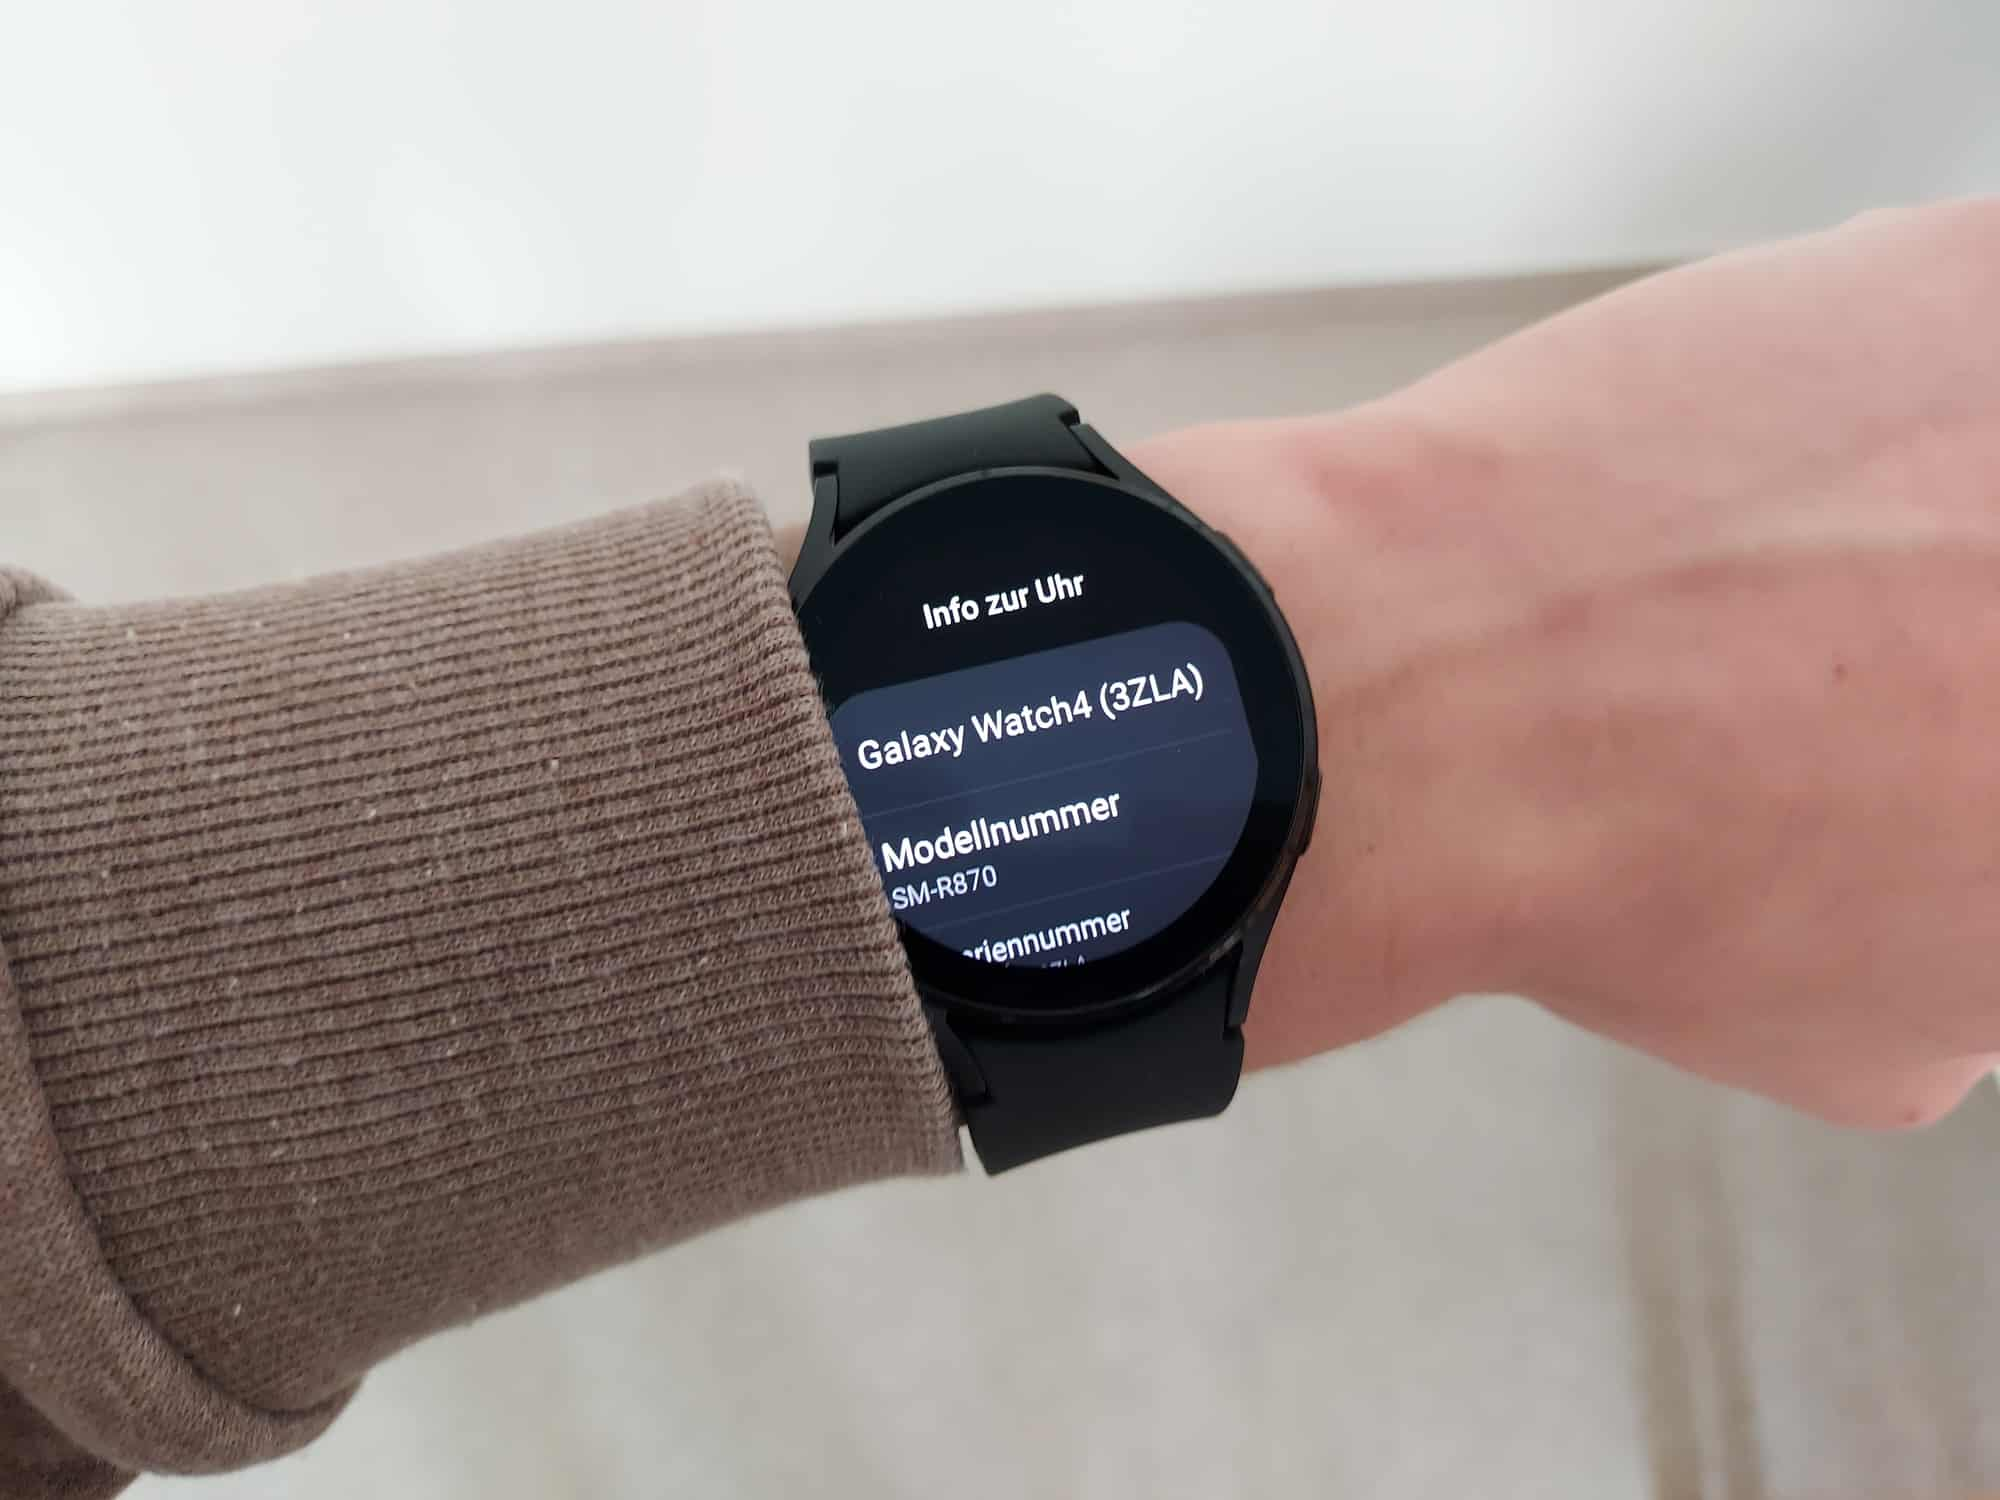 My new Samsung Galaxy Watch 4